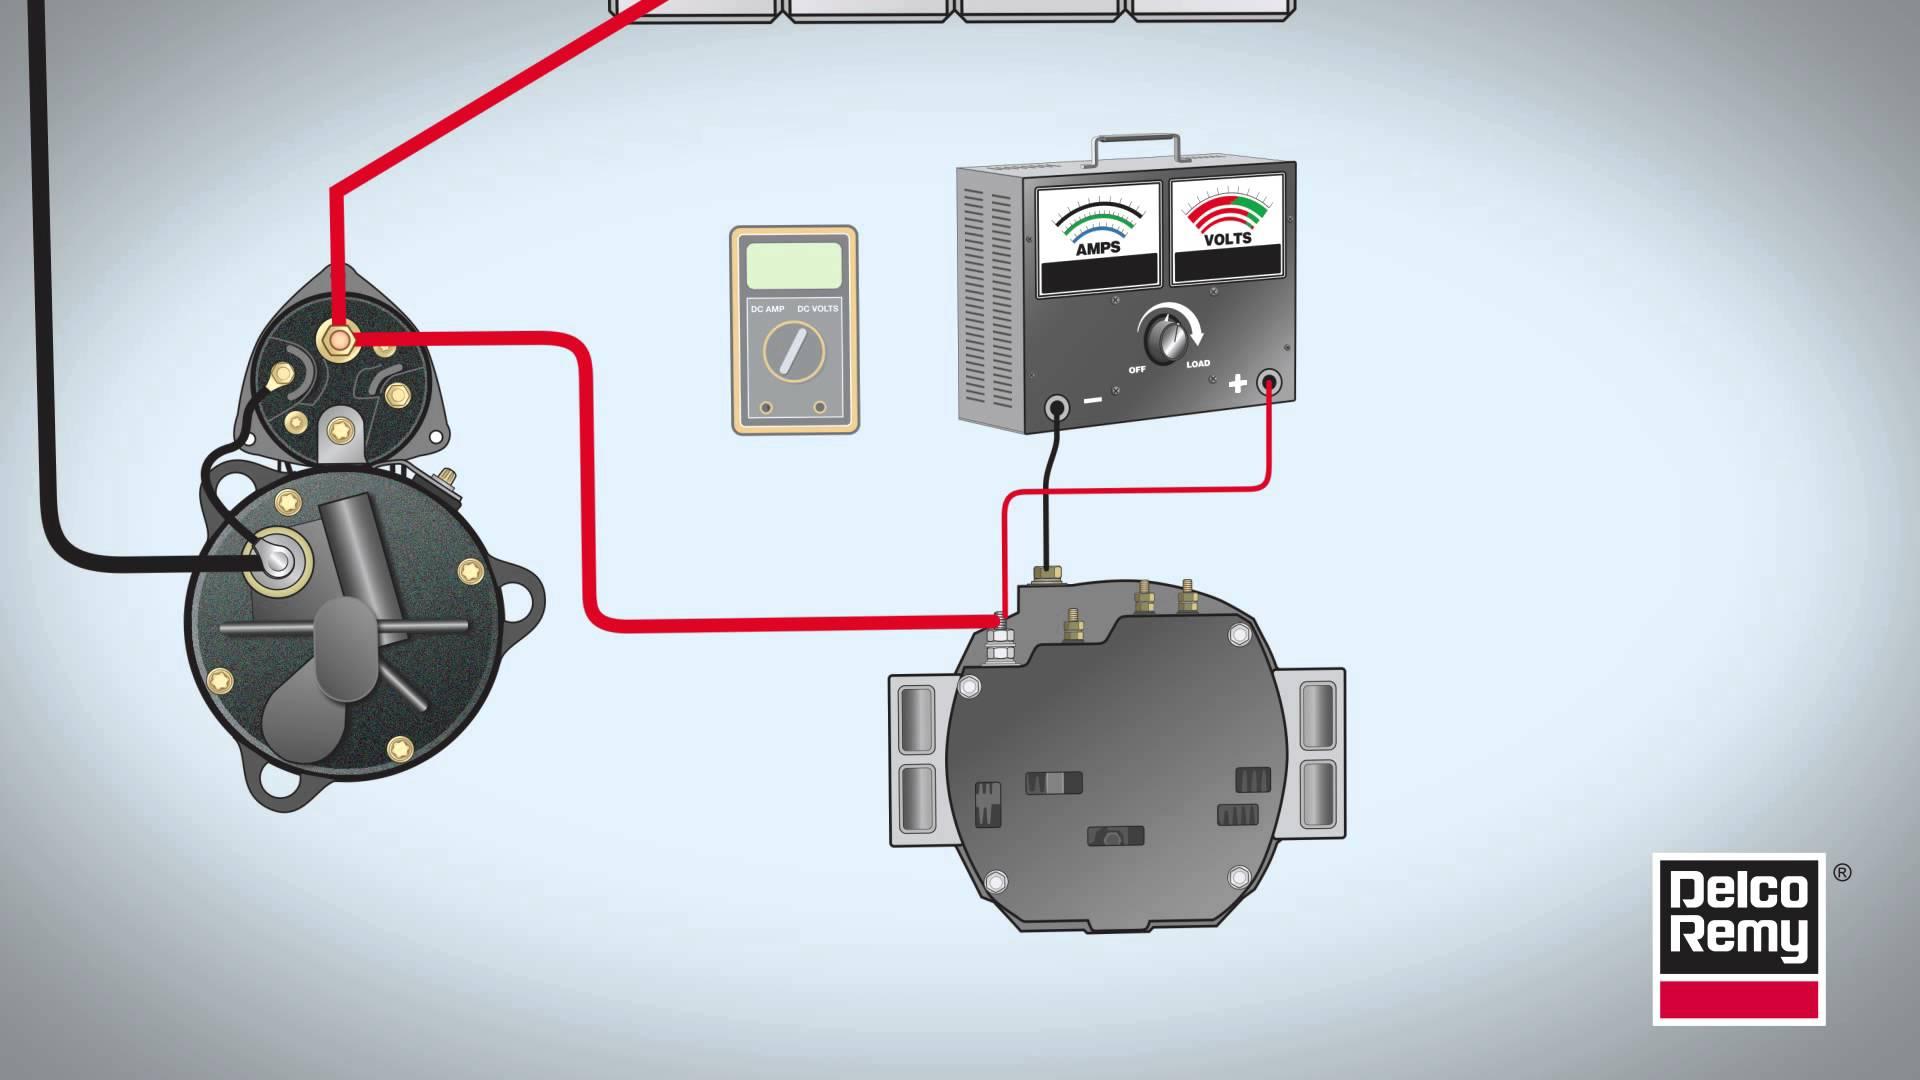 delco remy alternator diagram 2007 dodge caliber remote starter wiring tech tip videos